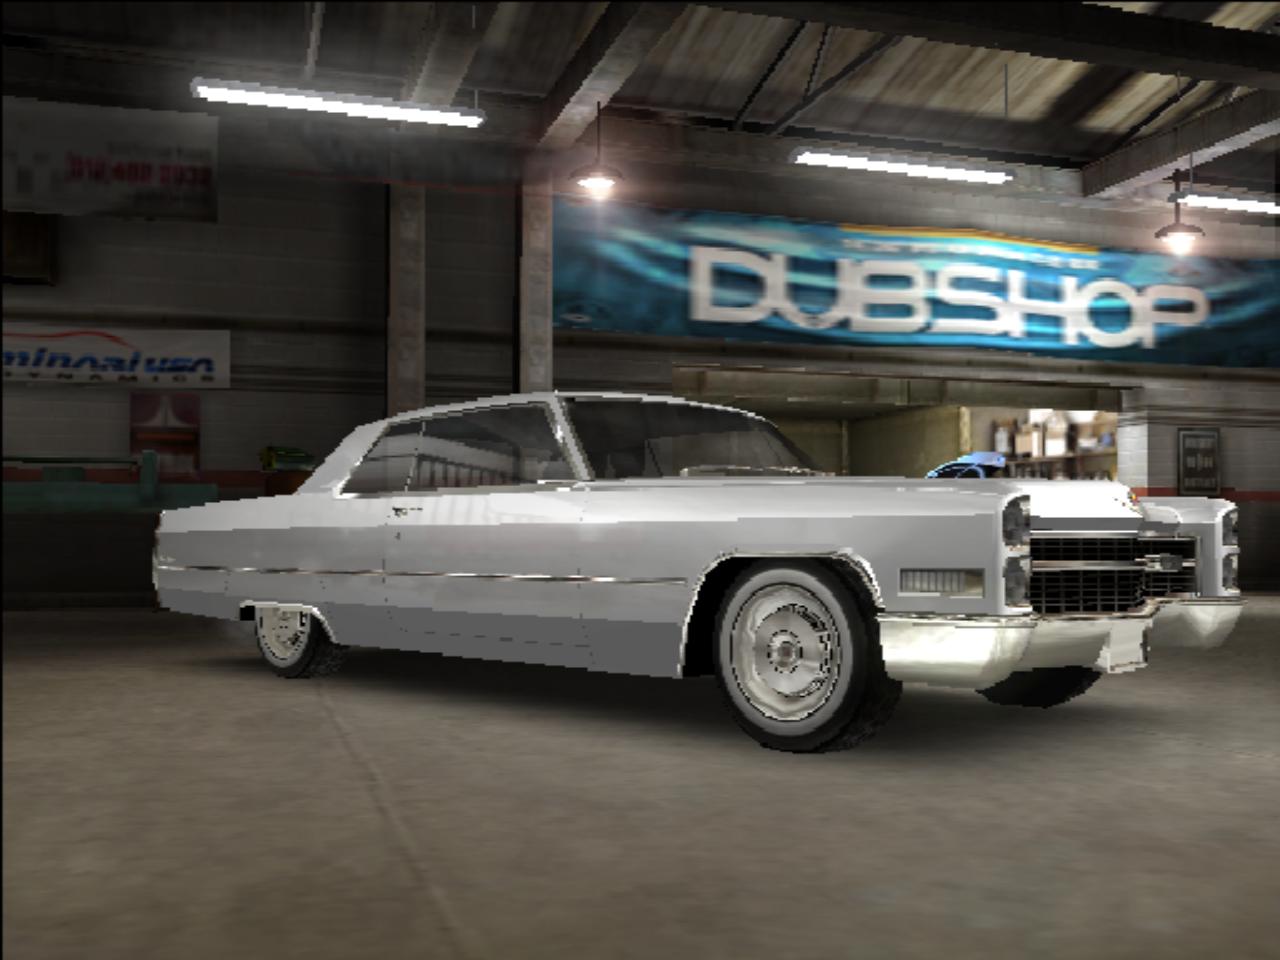 Cadillac DeVille | Midnight Club Wiki | FANDOM powered by Wikia